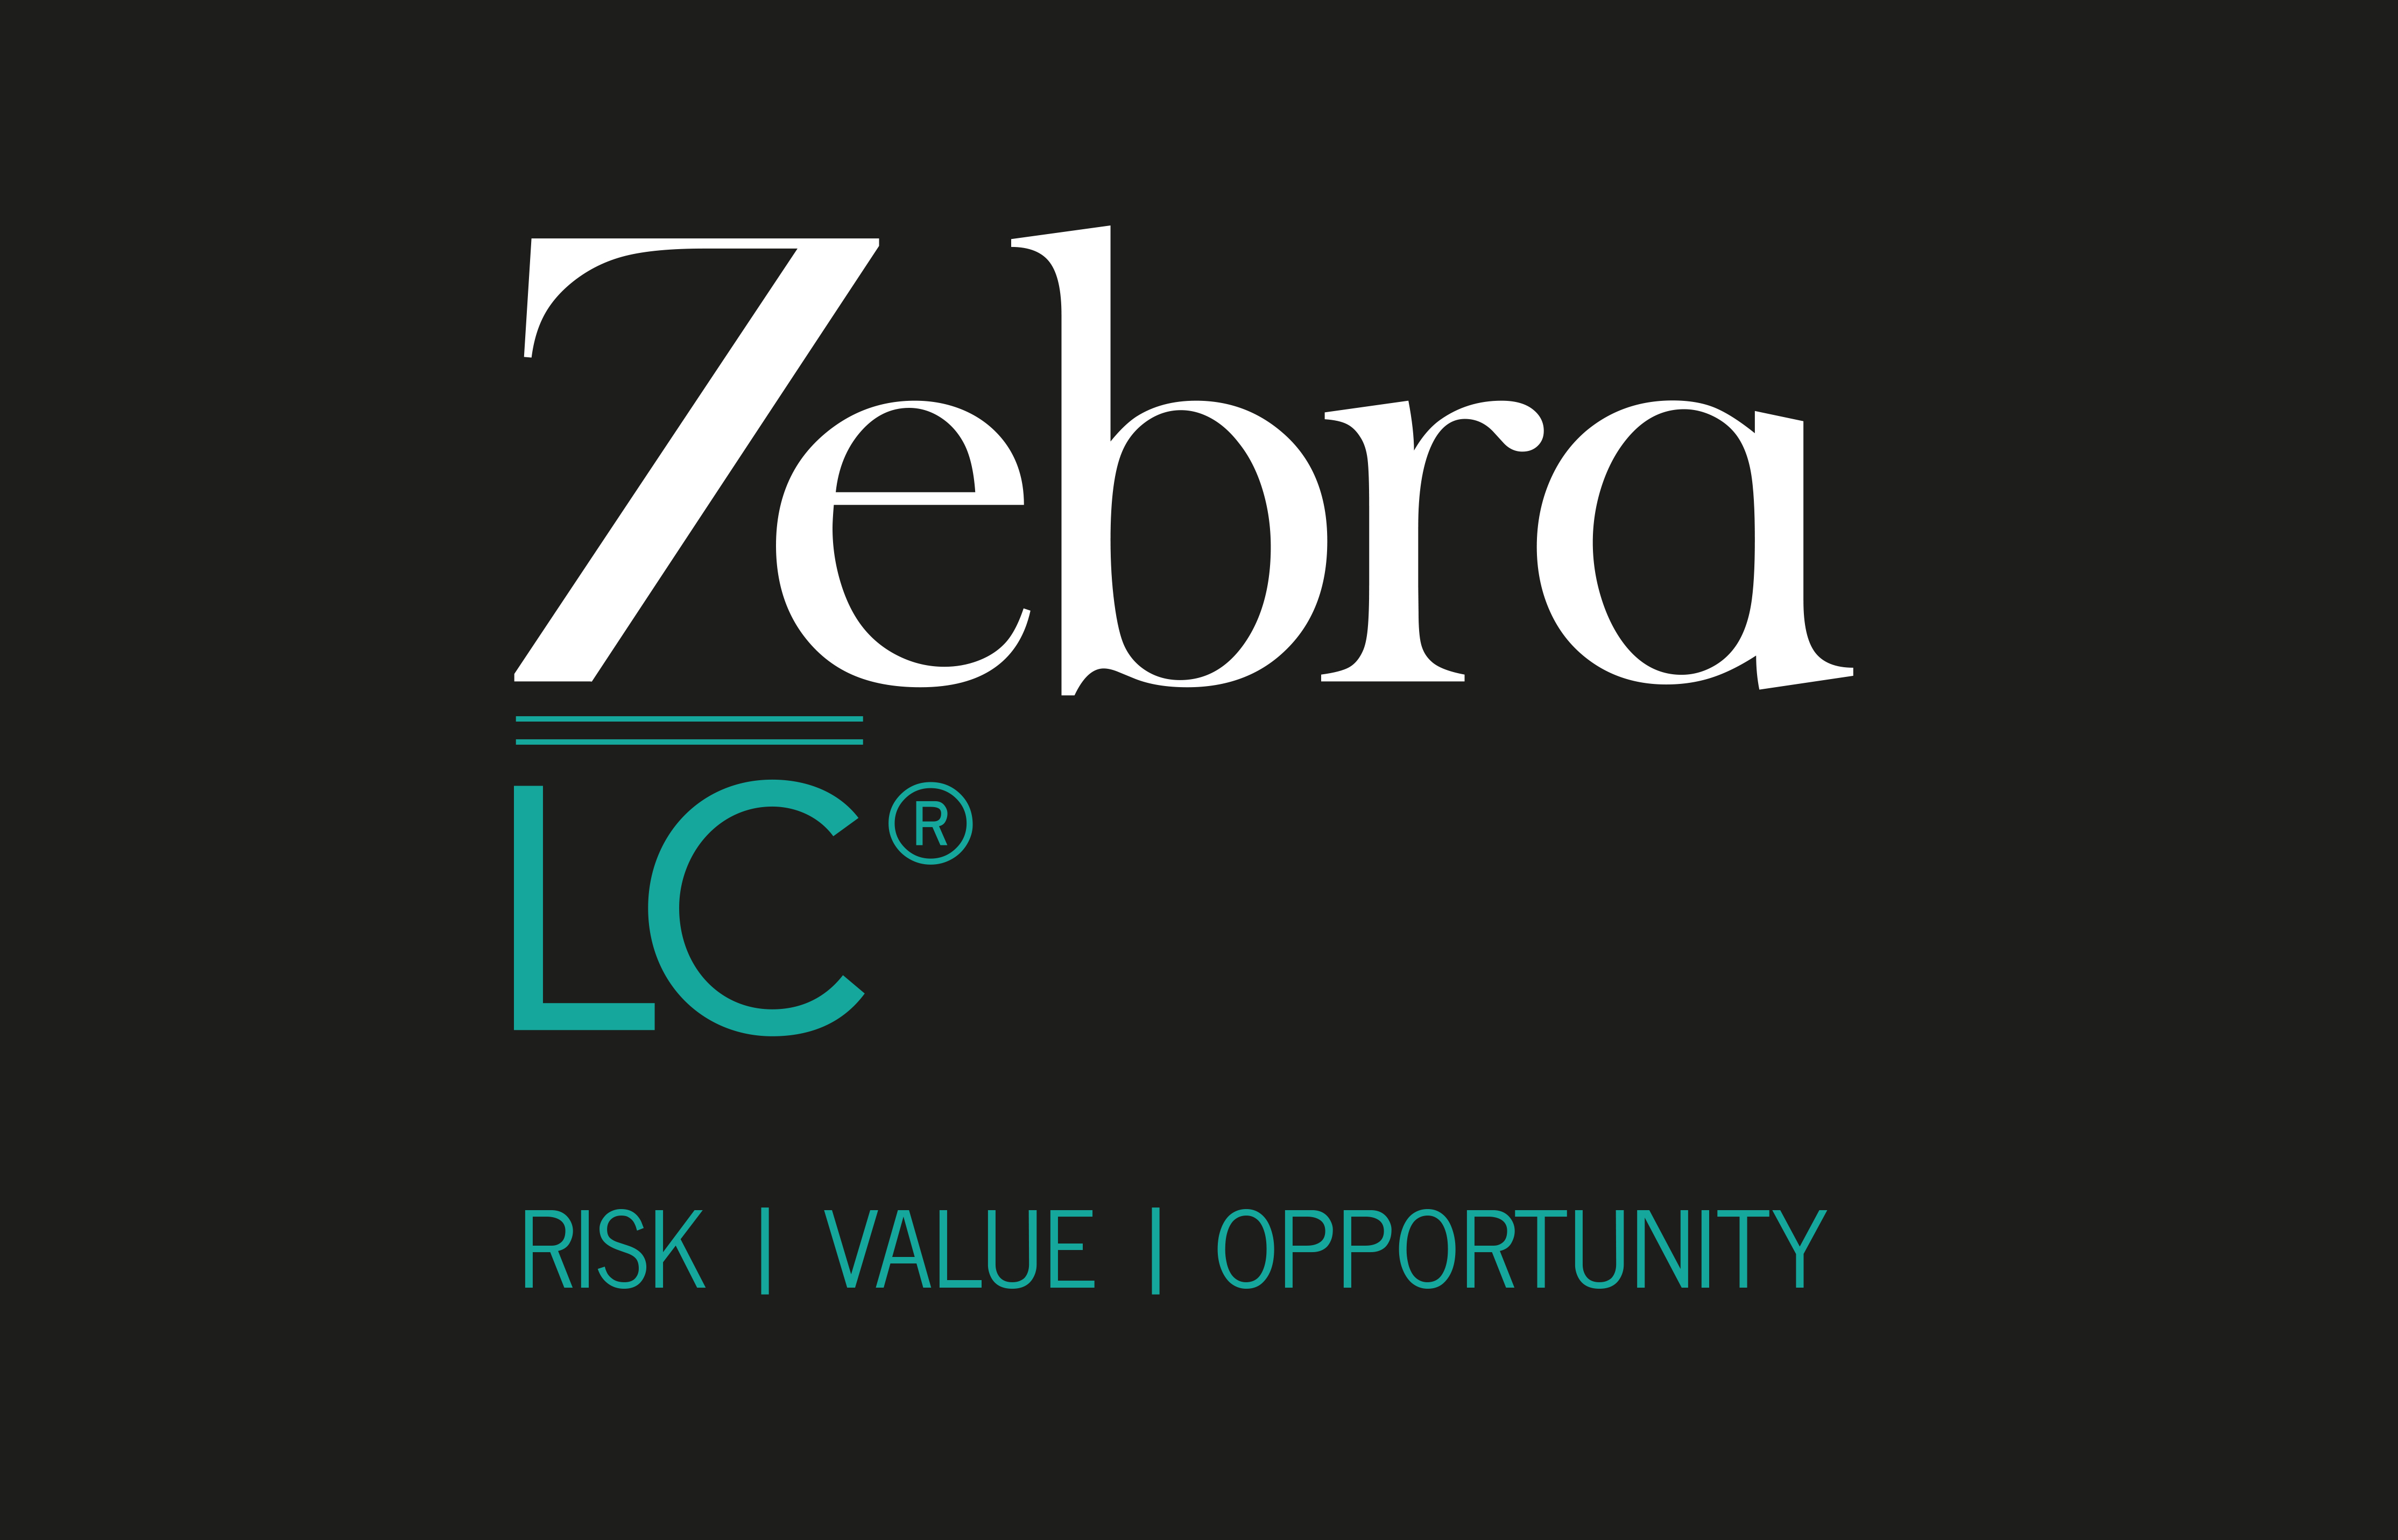 Zebra logo R white on black strapline